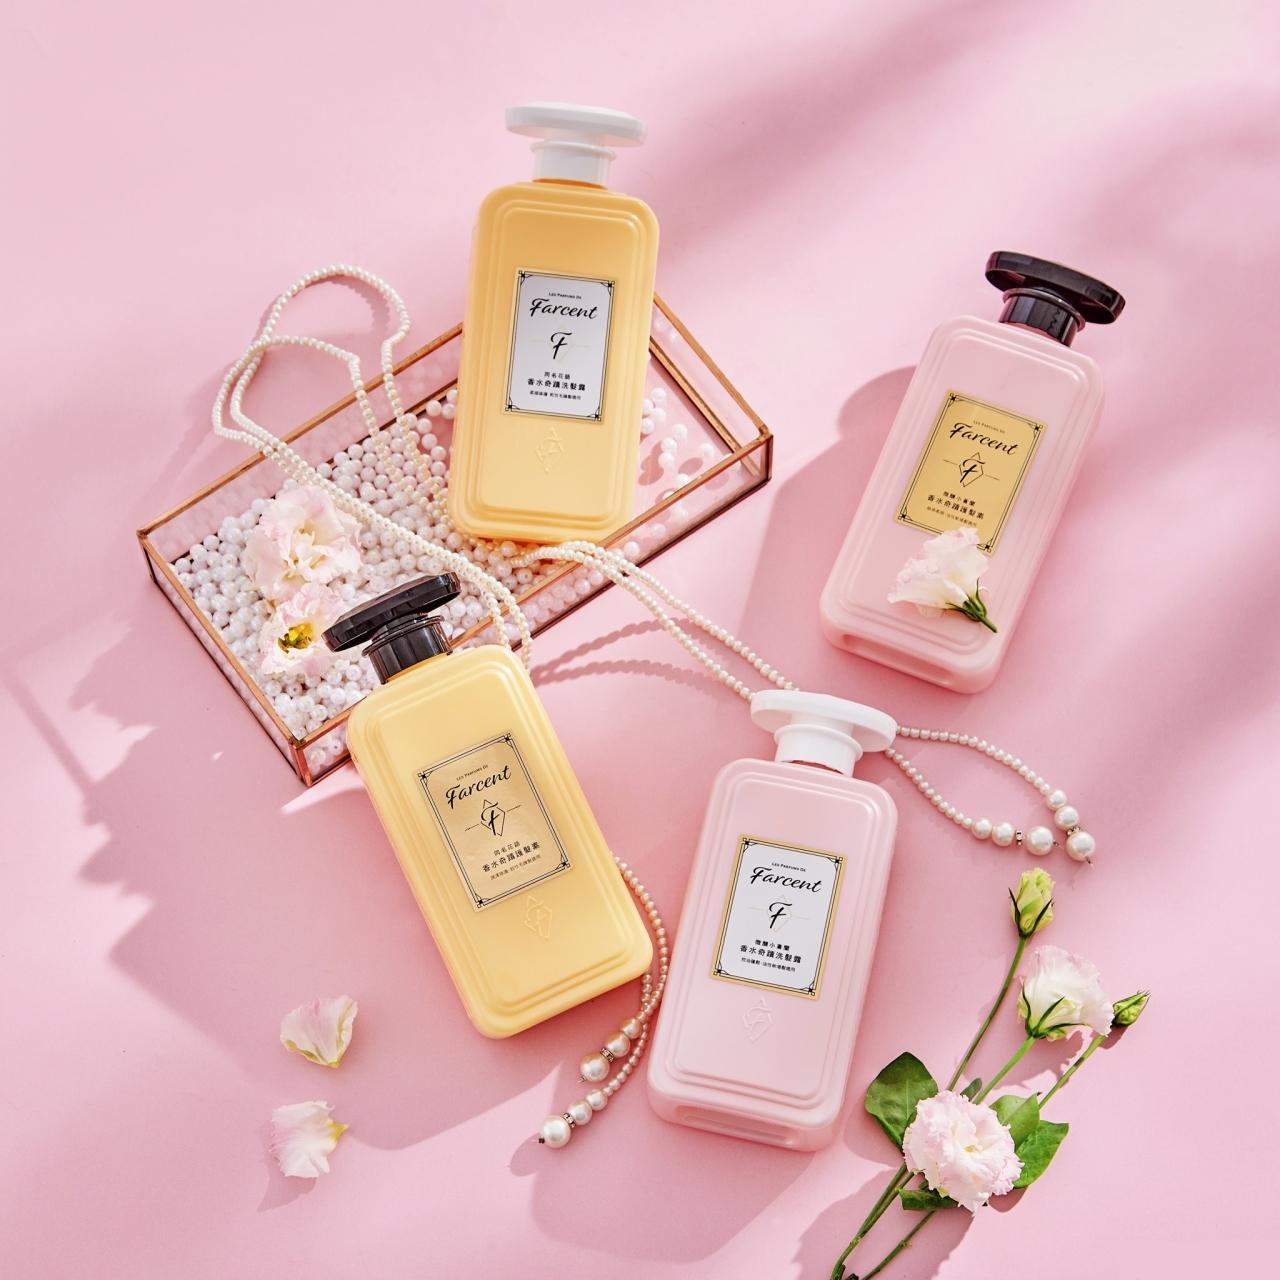 Farcent香水奇蹟洗髮露 自然蓬鬆/柔順修護 Shampoo /Conditioner 600ml